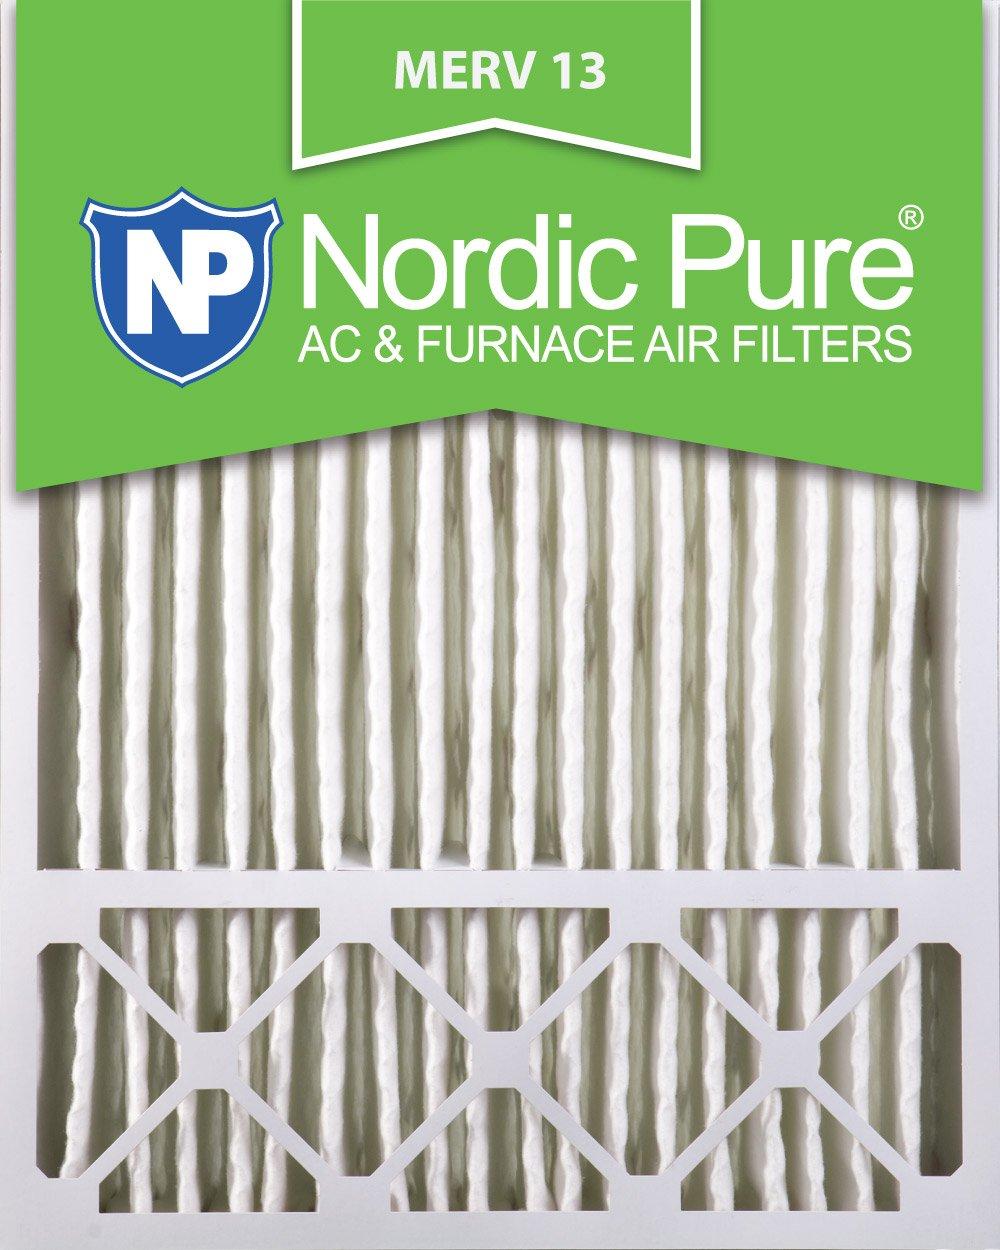 Nordic Pure 20x25x5 (4-3/8 Actual Depth) MERV 13 Lennox X6673, X6675 Replacement AC Furnace Air Filter, 2 Piece